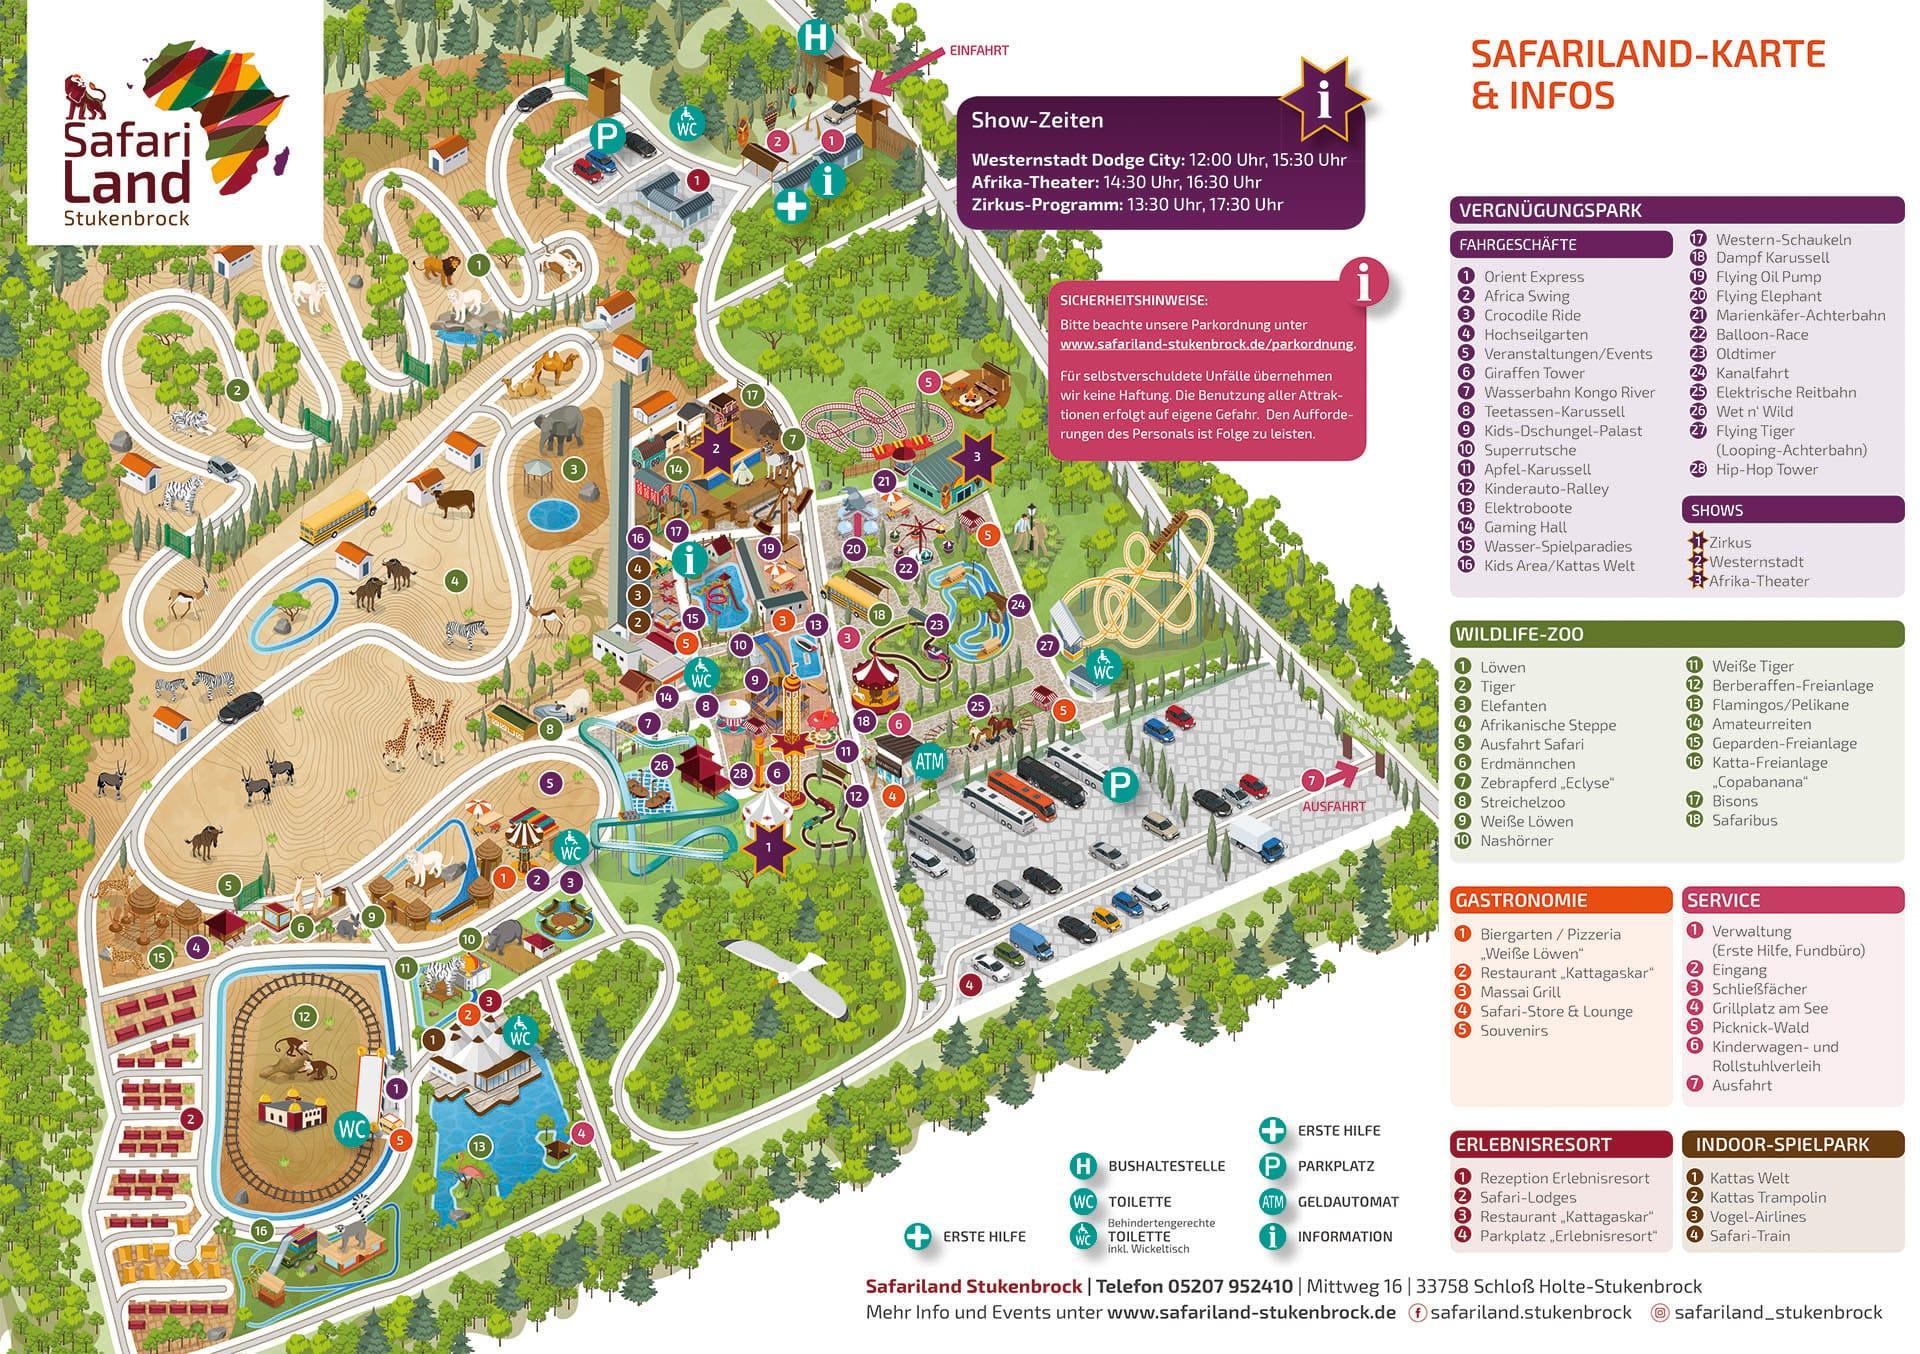 Safaripark Karte 2020